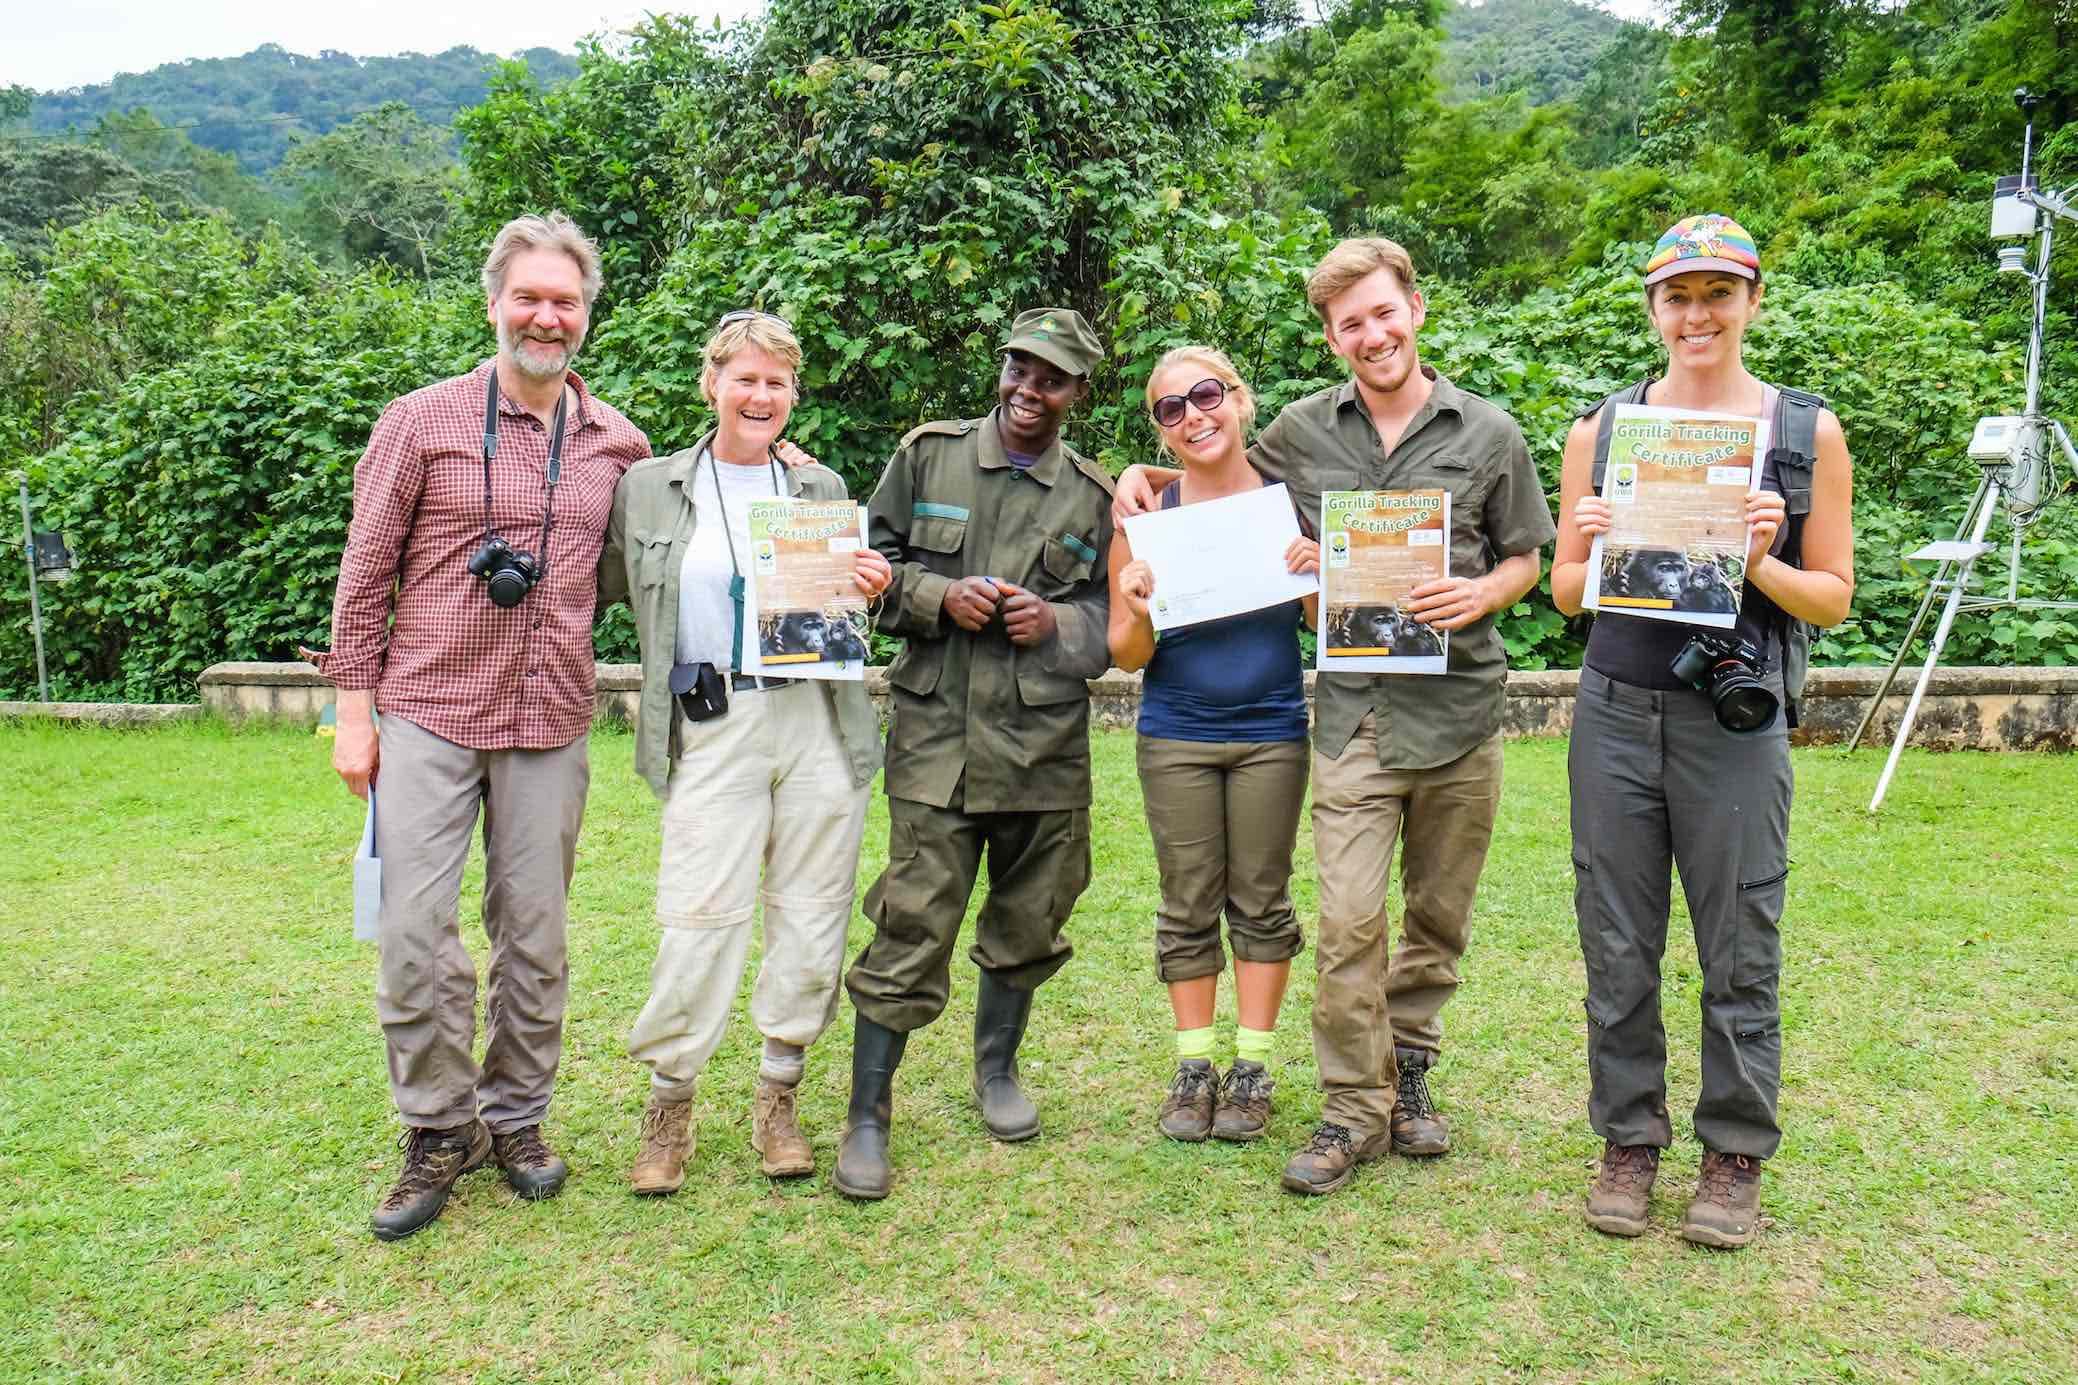 Completion of our Ugandan gorilla trek